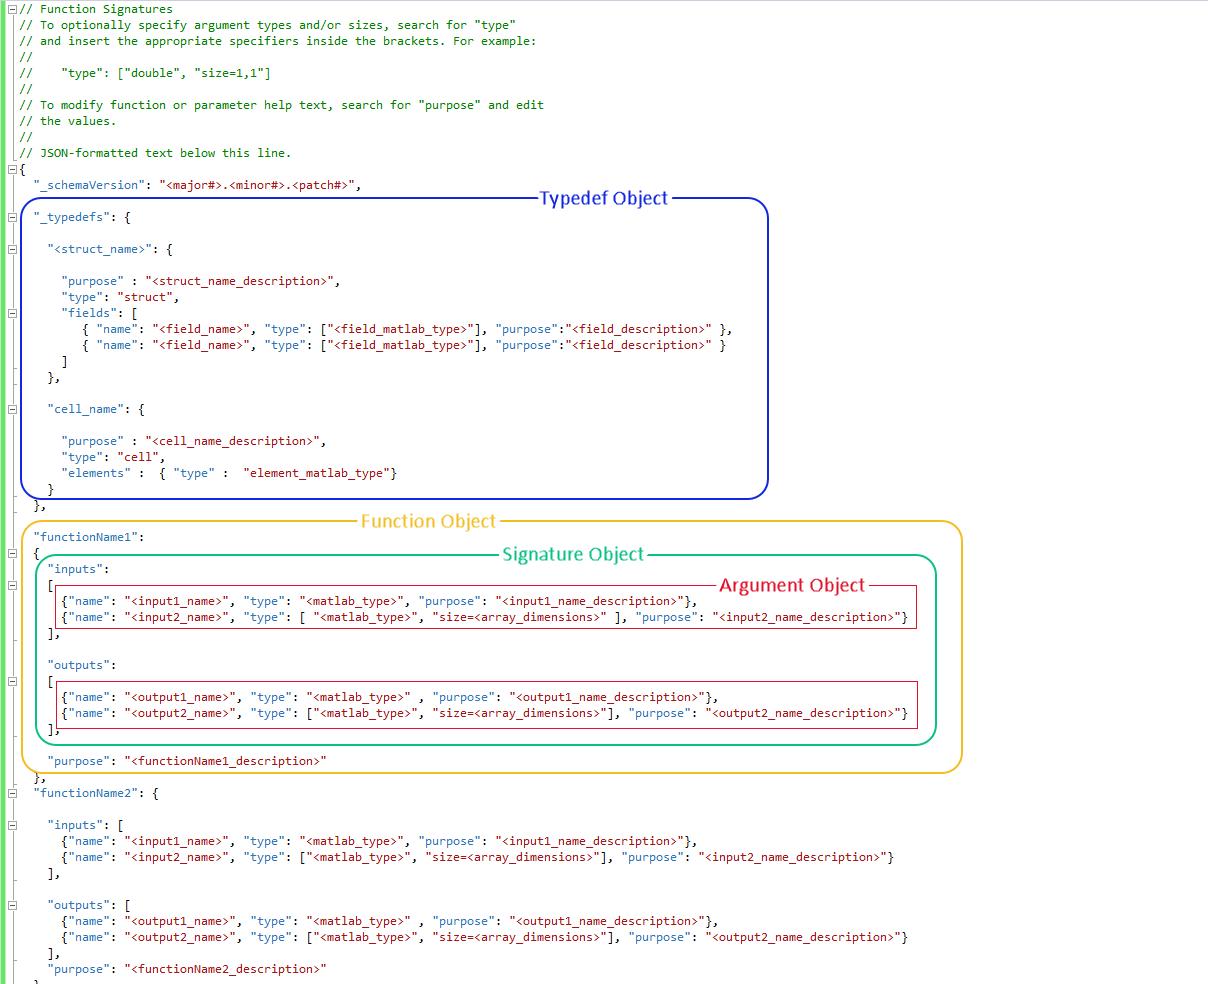 MATLAB Function Signatures in JSON - MATLAB & Simulink